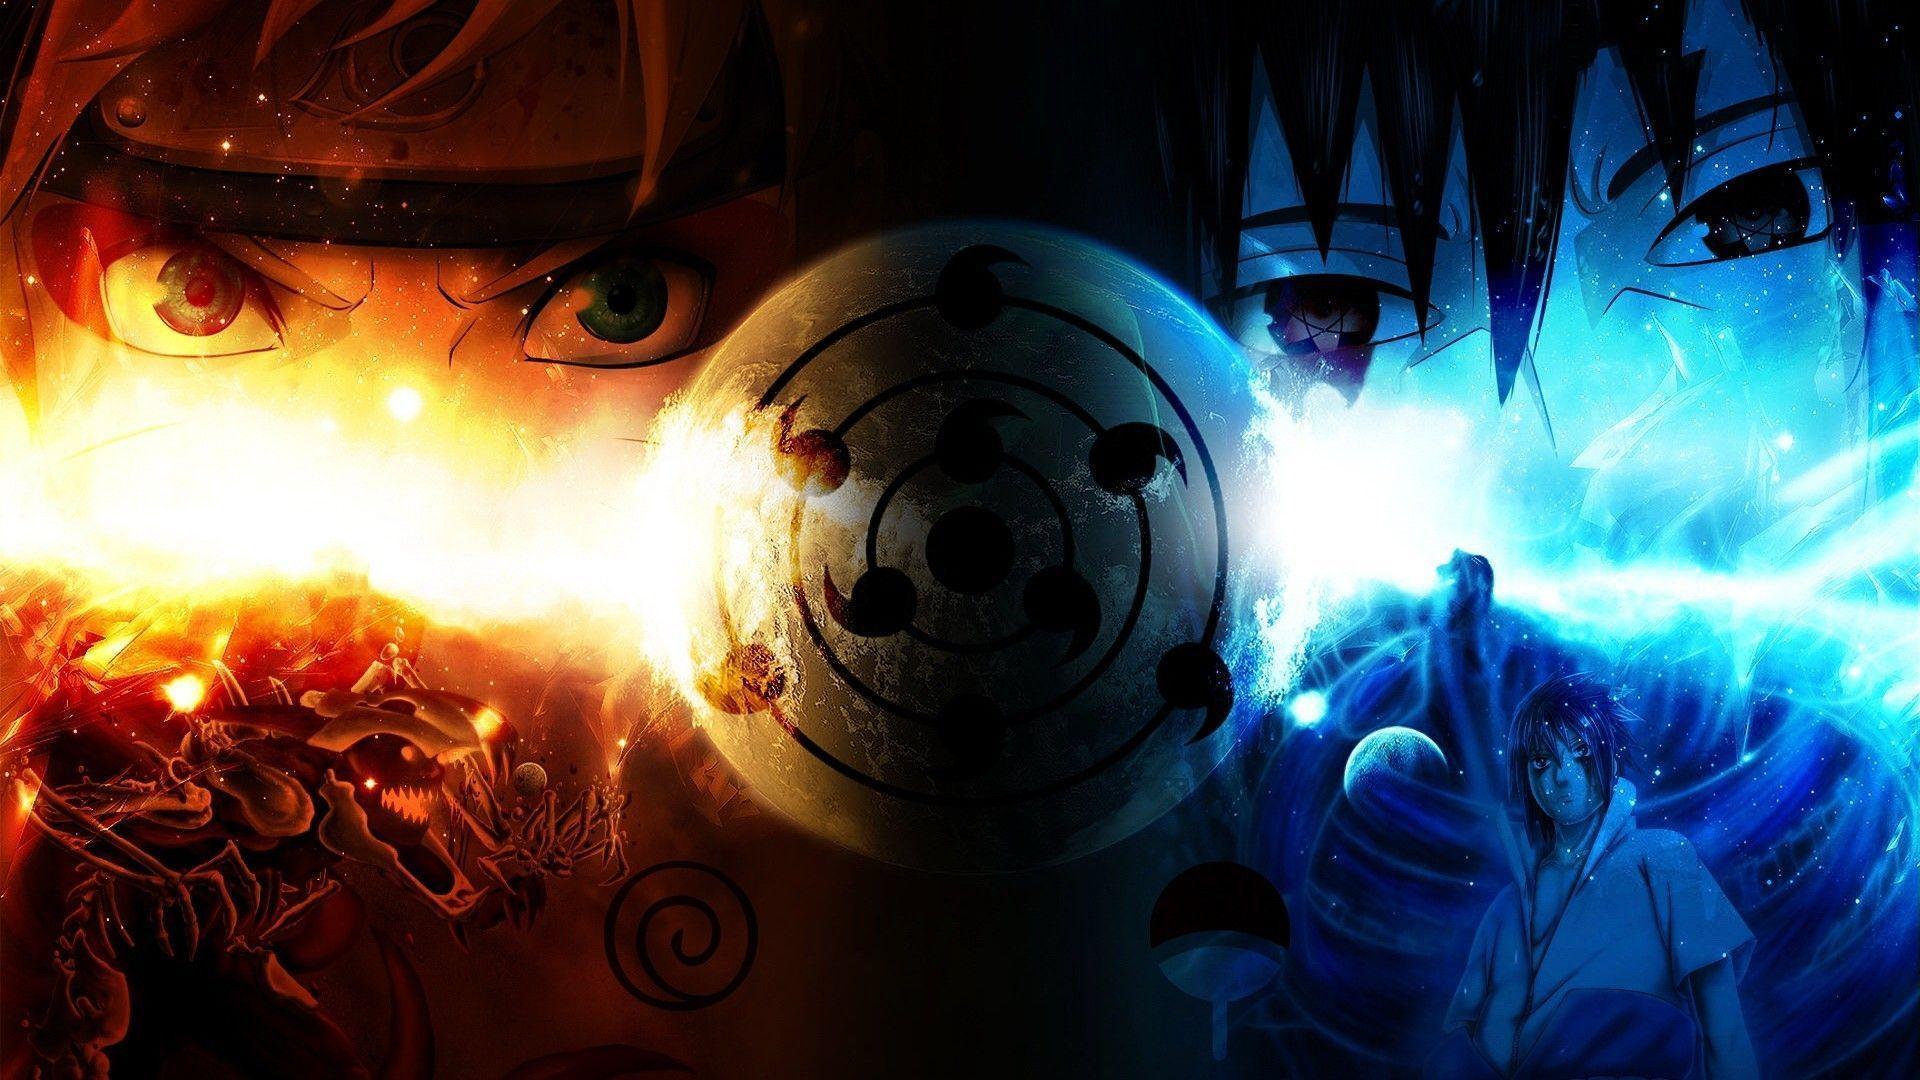 Download Naruto Desktop Wallpaper Hd Backgrounds Download Itl Cat